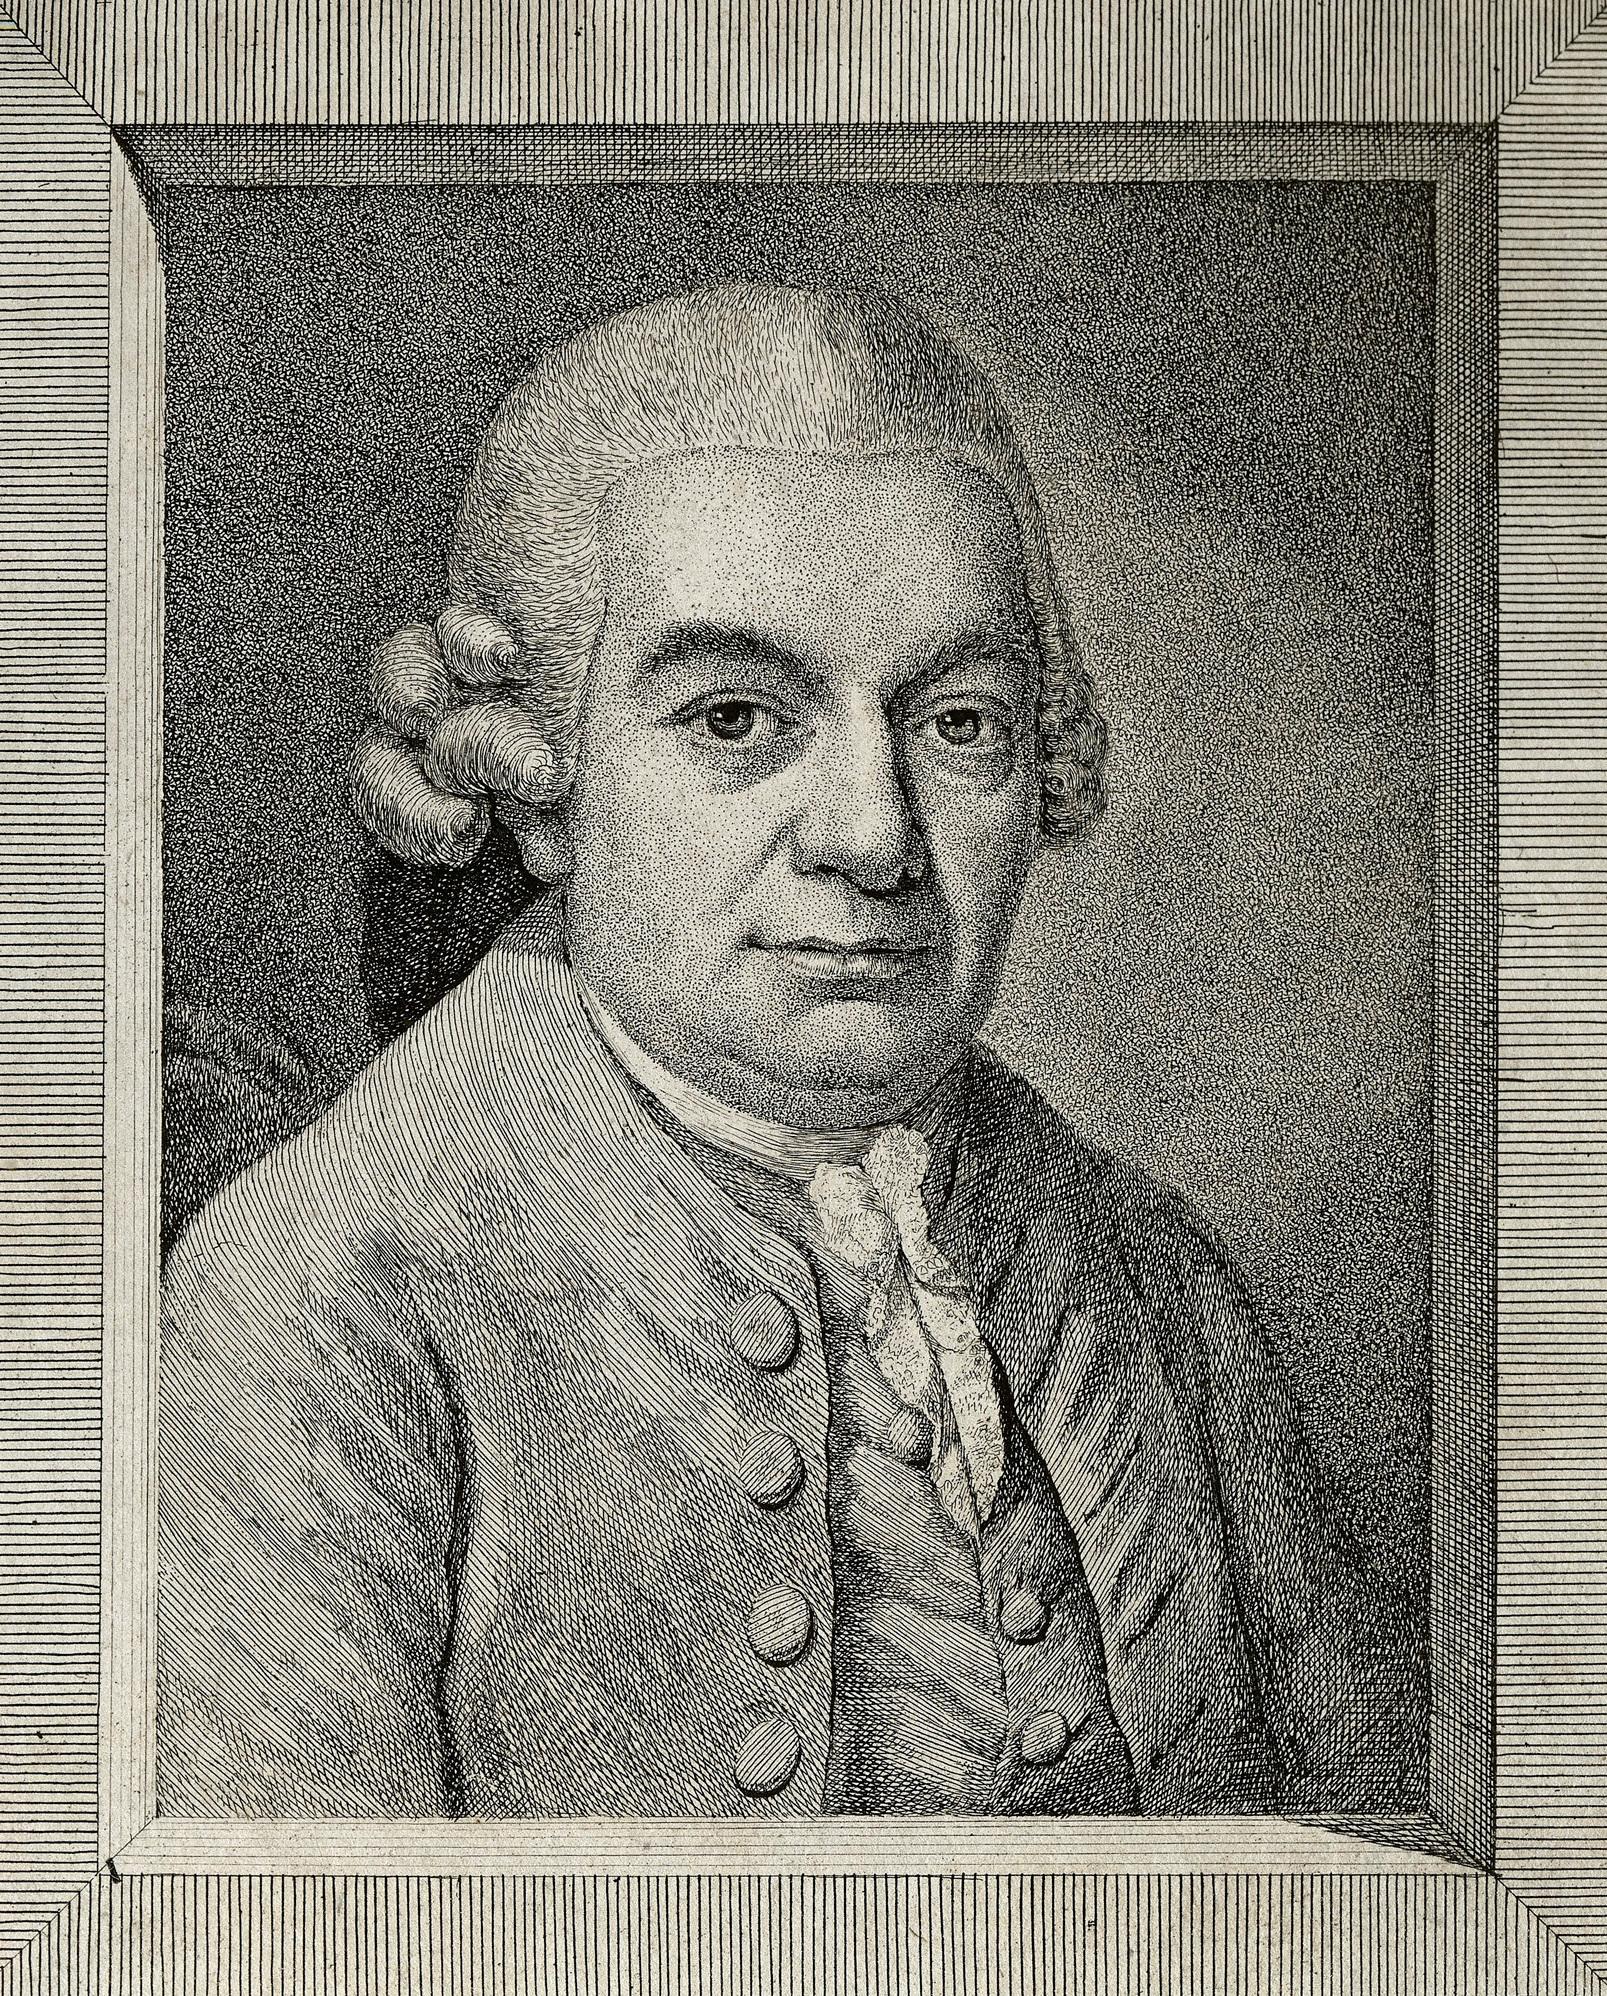 a biography of carl philipp emanuel bach Get this from a library carl philipp emanuel bach [hans-günter ottenberg.